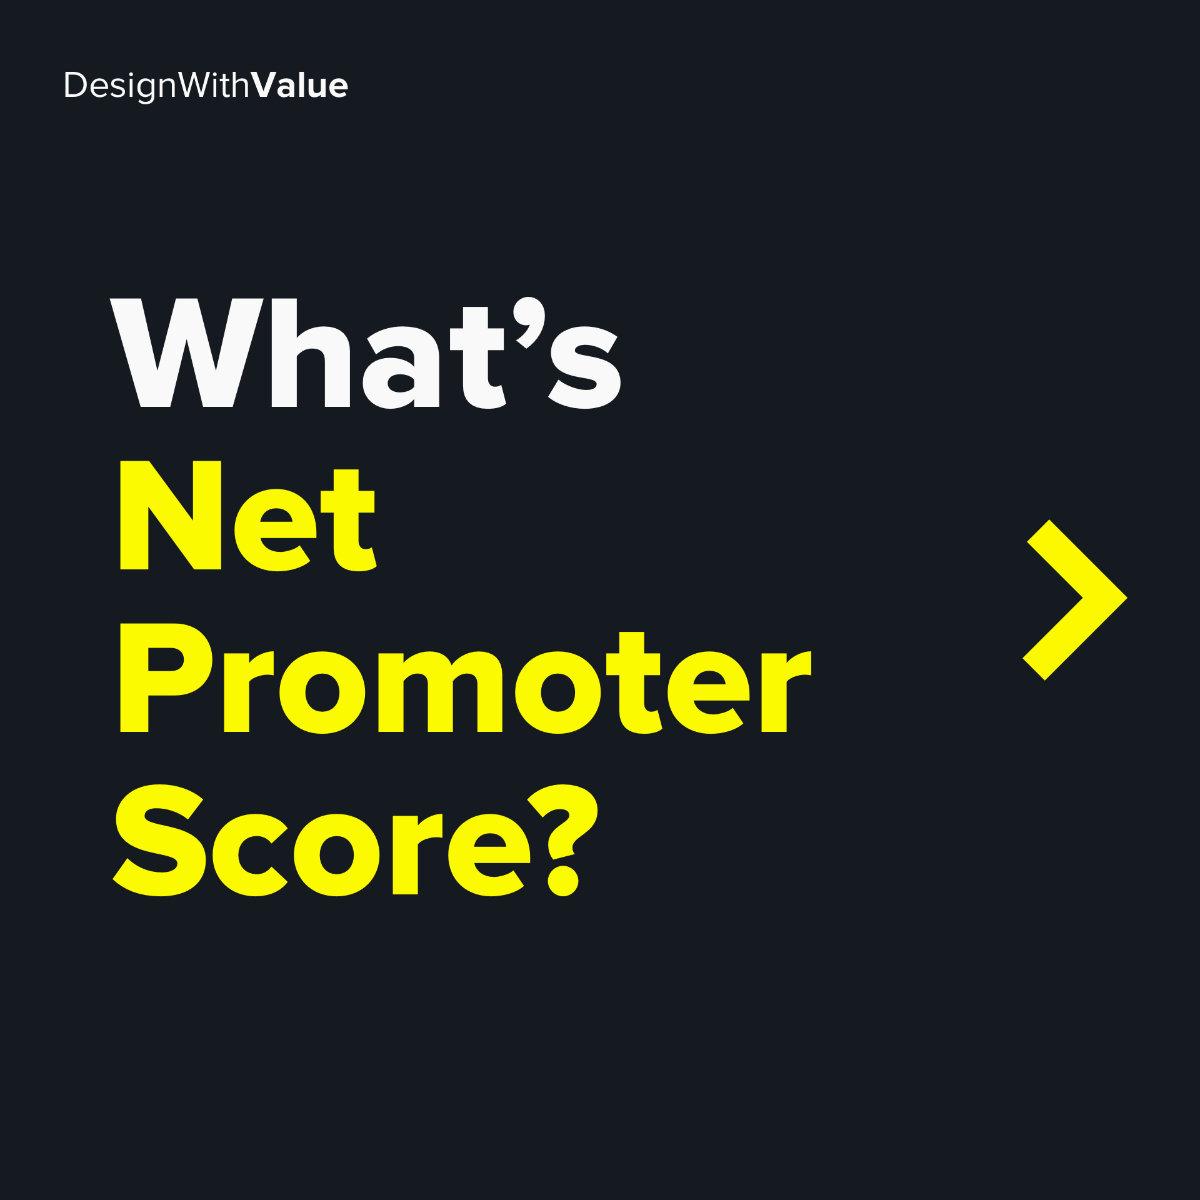 What's net promoter score?